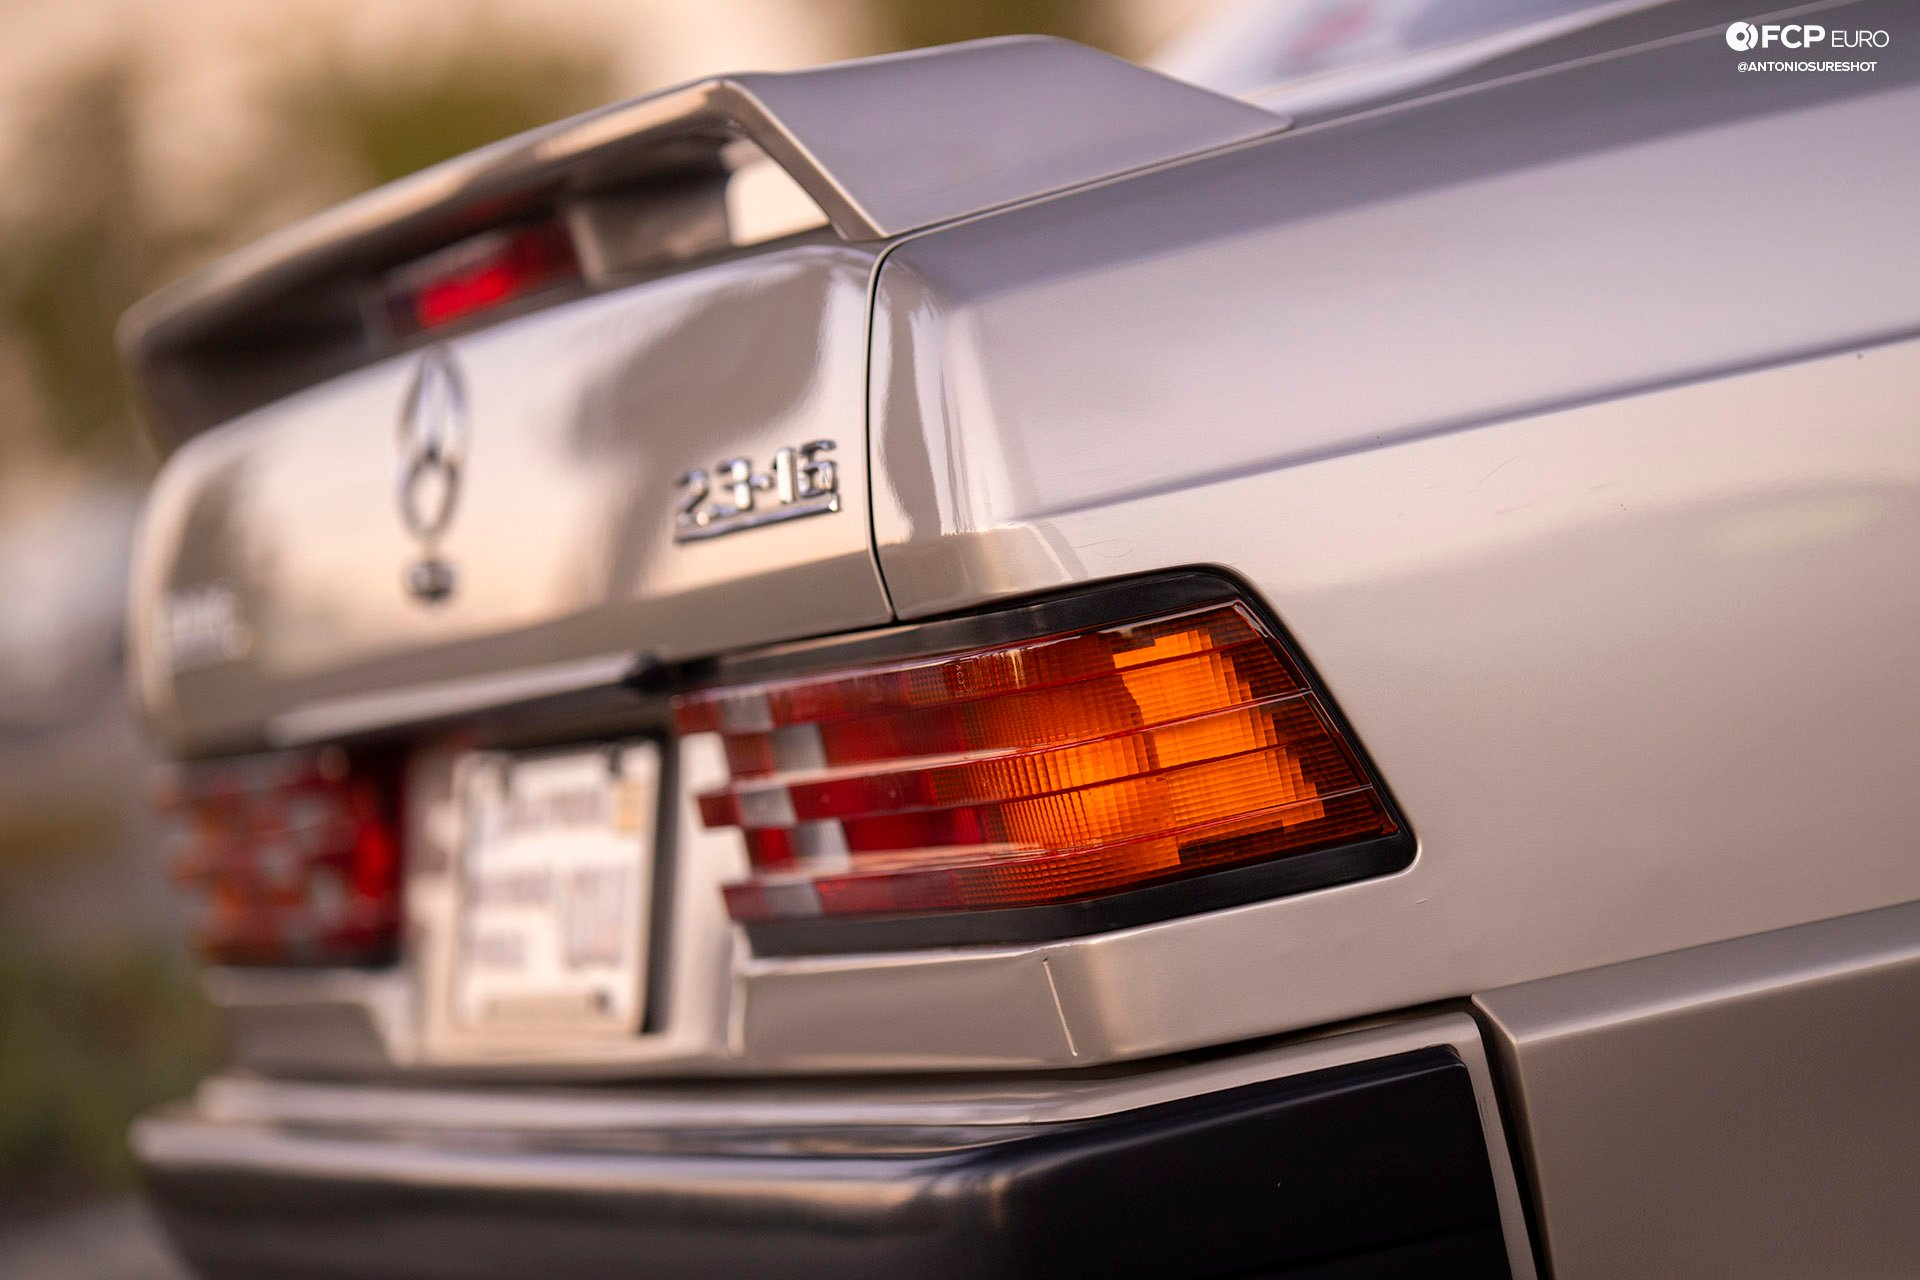 Mercedes Benz 190E 2.3 16v Cosworth EOSR1593